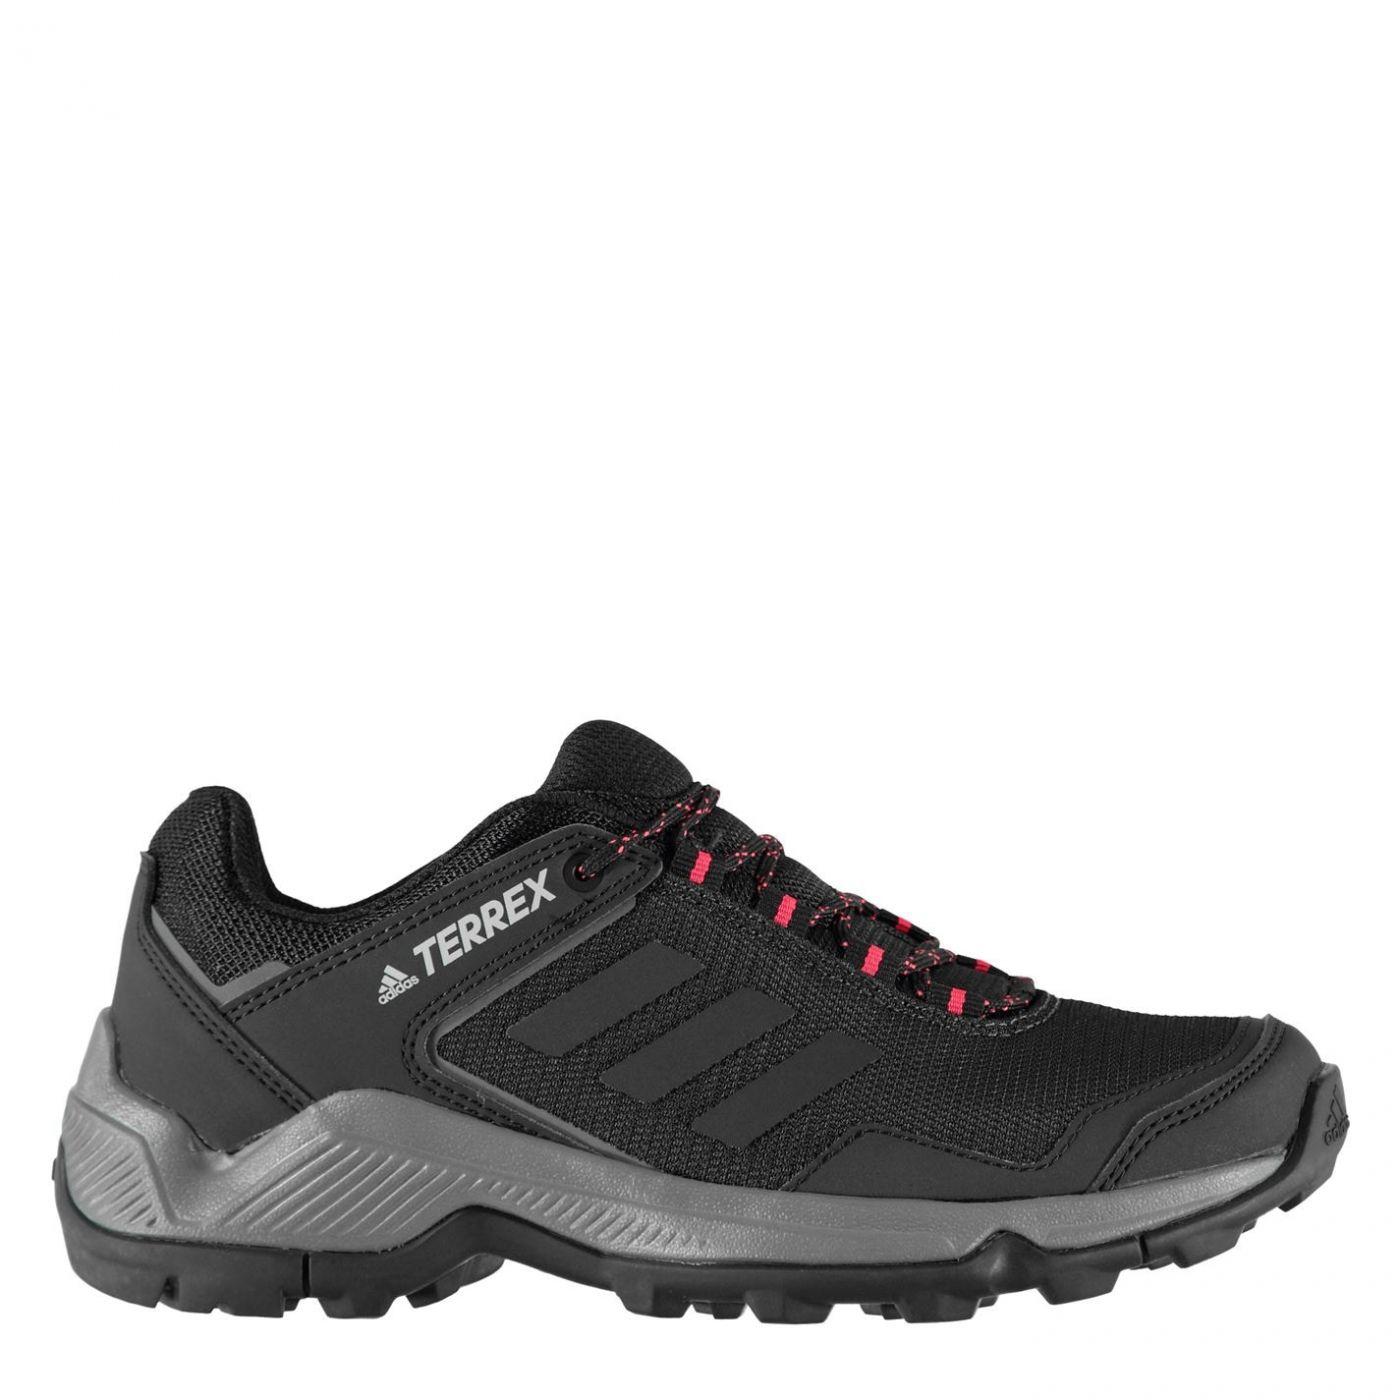 Adidas Terrex Eastrail Ladies Walking Shoes